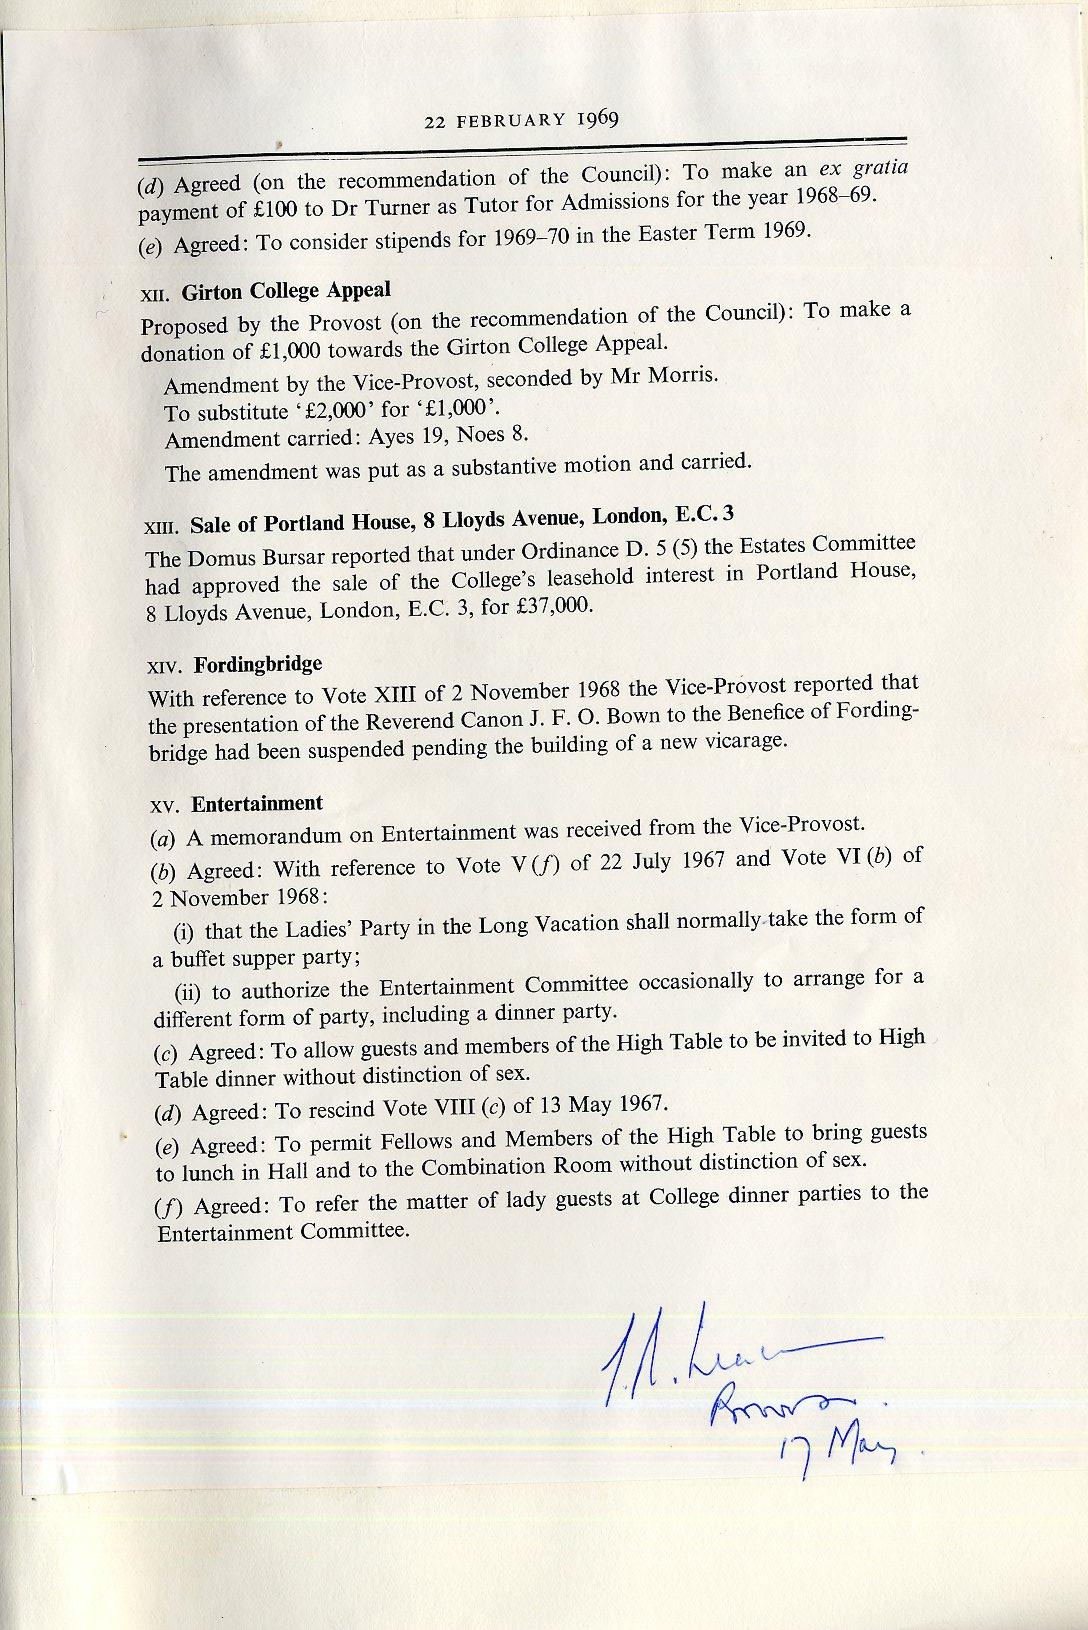 Governing Body minutes, 22 February 1969. [KCGB/4/1/1/22]